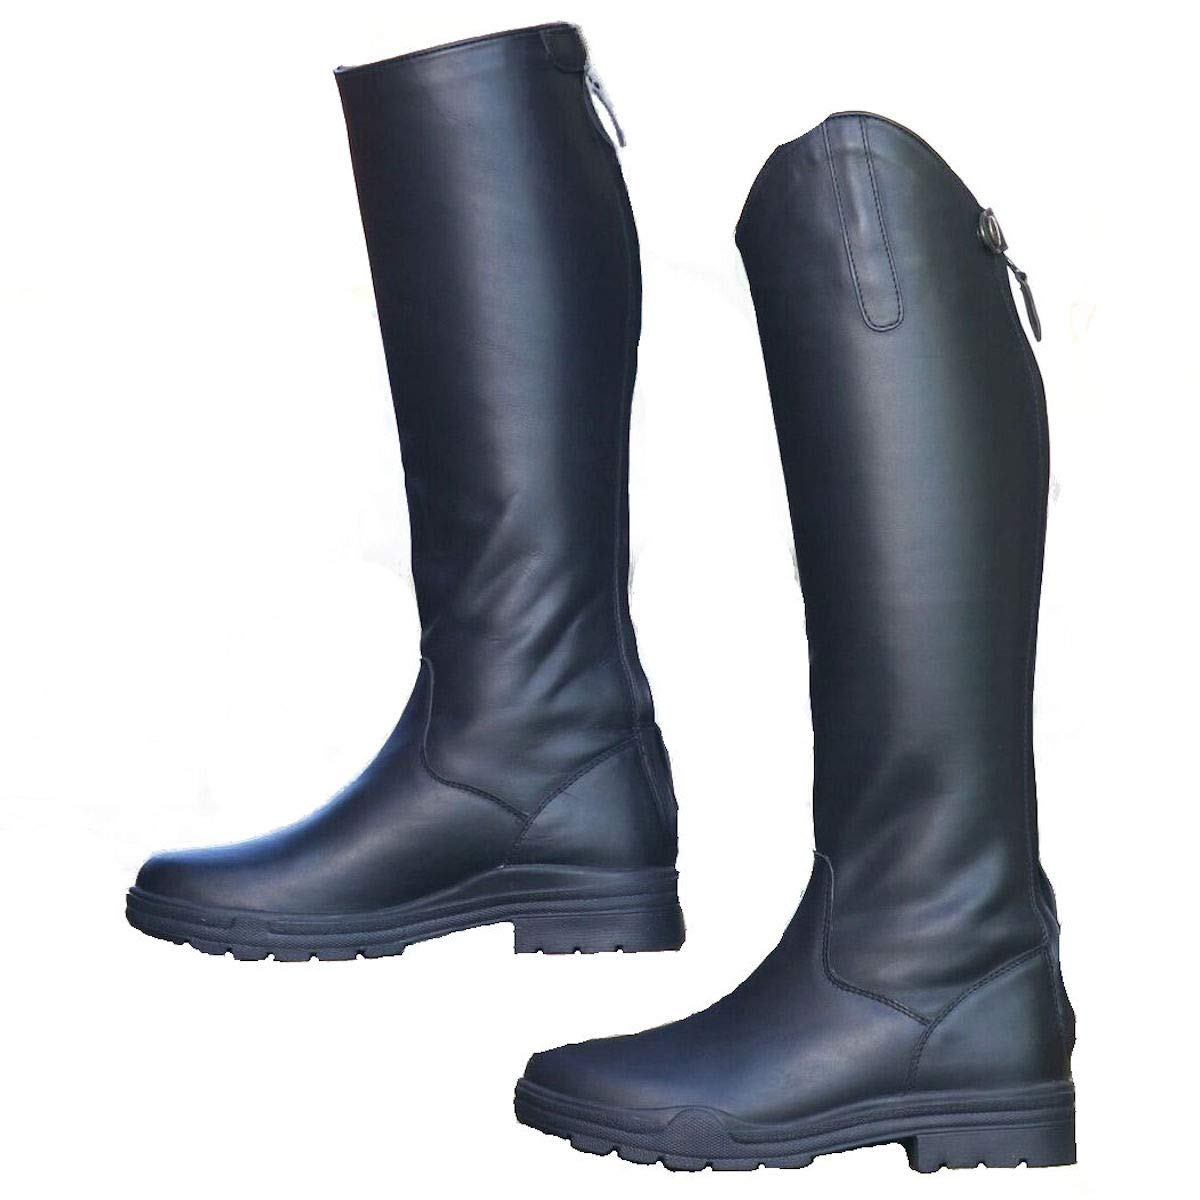 Moreton (lang Leder Leder Leder Reitstiefel Reiten Schuhe stabile Yard 359970